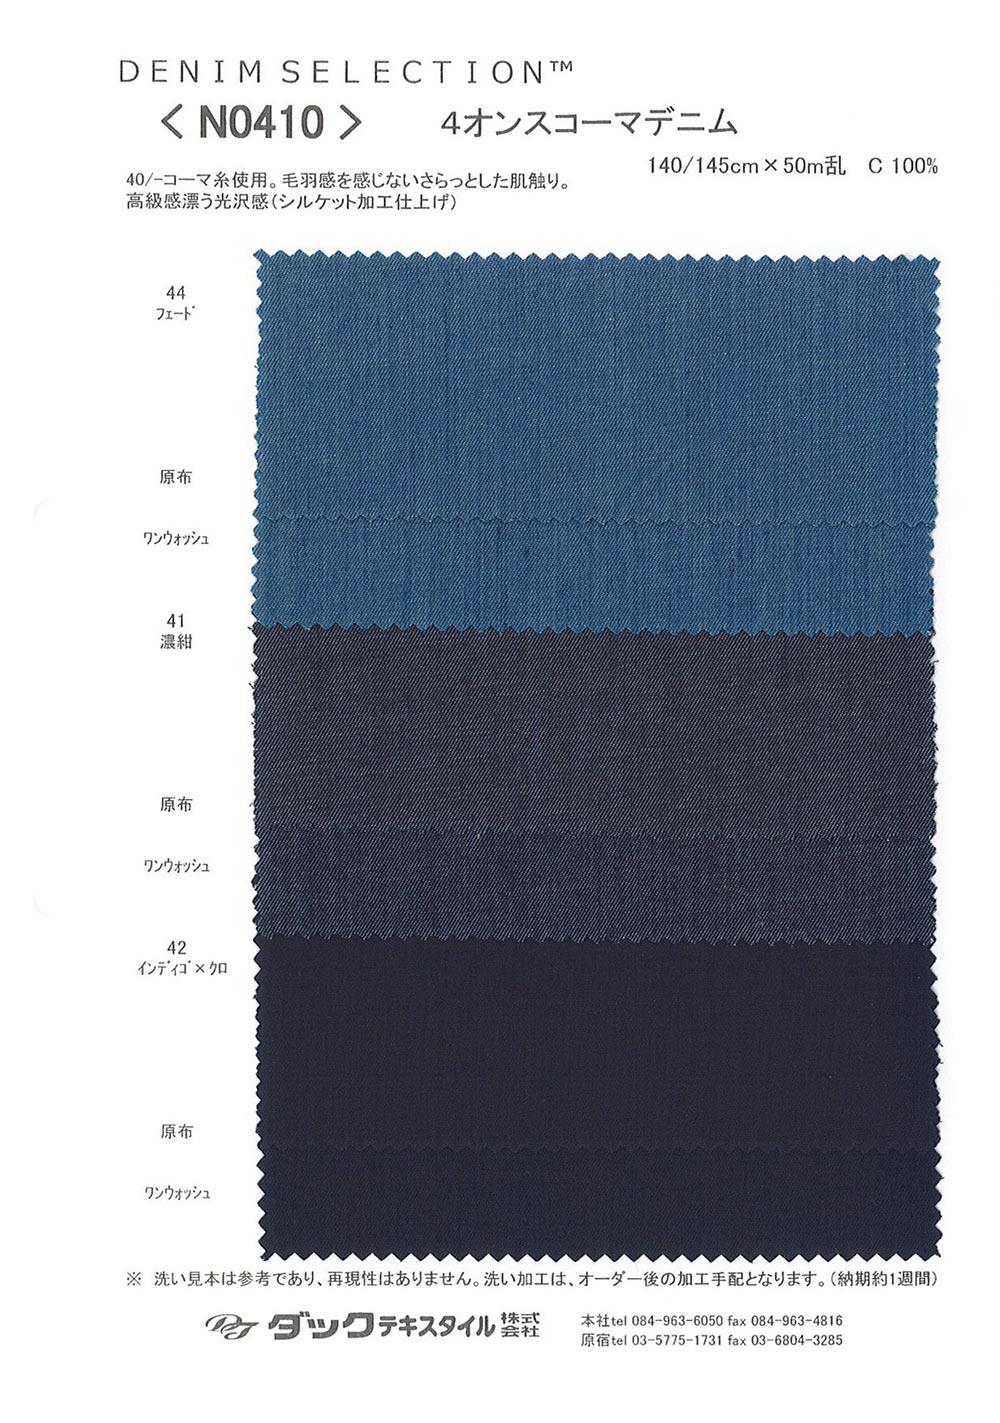 N0410 4オンスコーマデニム[生地] ダックテキスタイル/オークラ商事 - ApparelX アパレル資材卸通販